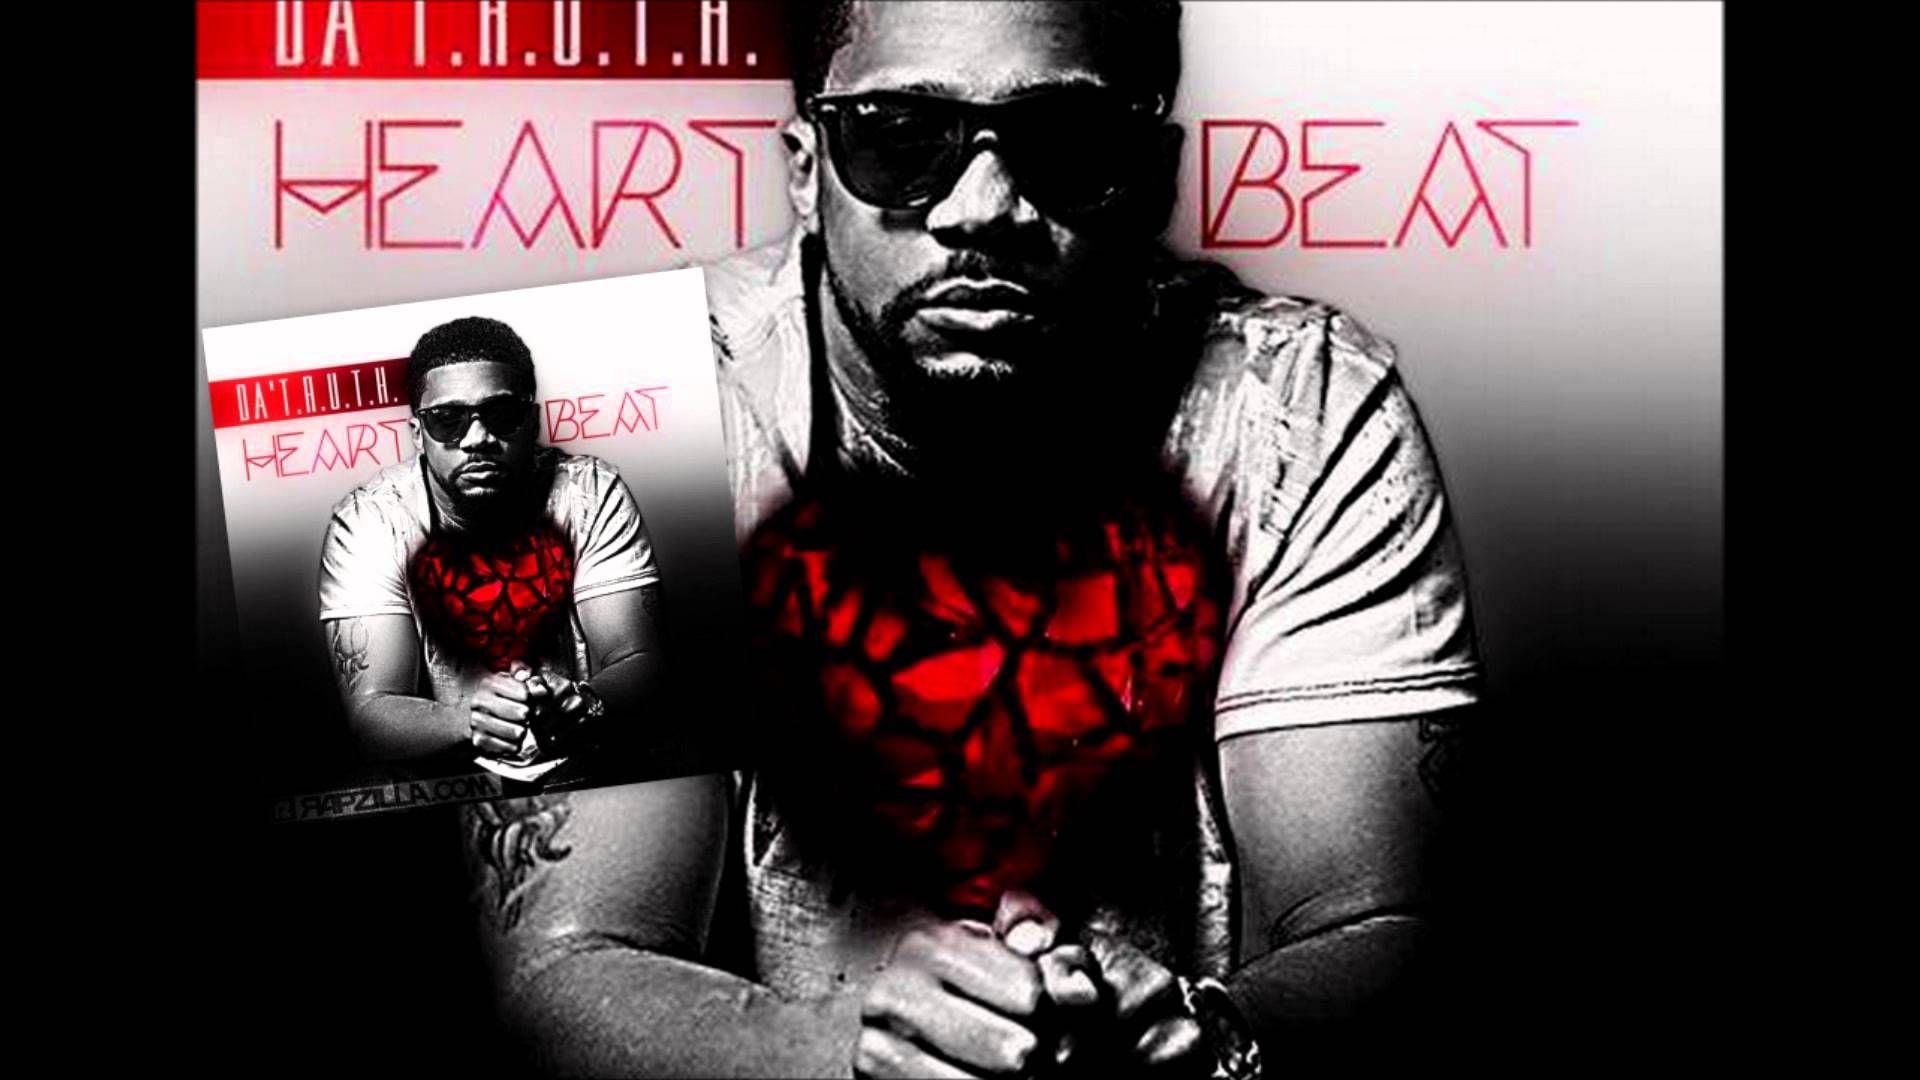 Da' T.R.U.T.H. Heartbeat ft. Lecrae & Lauren Lee prod